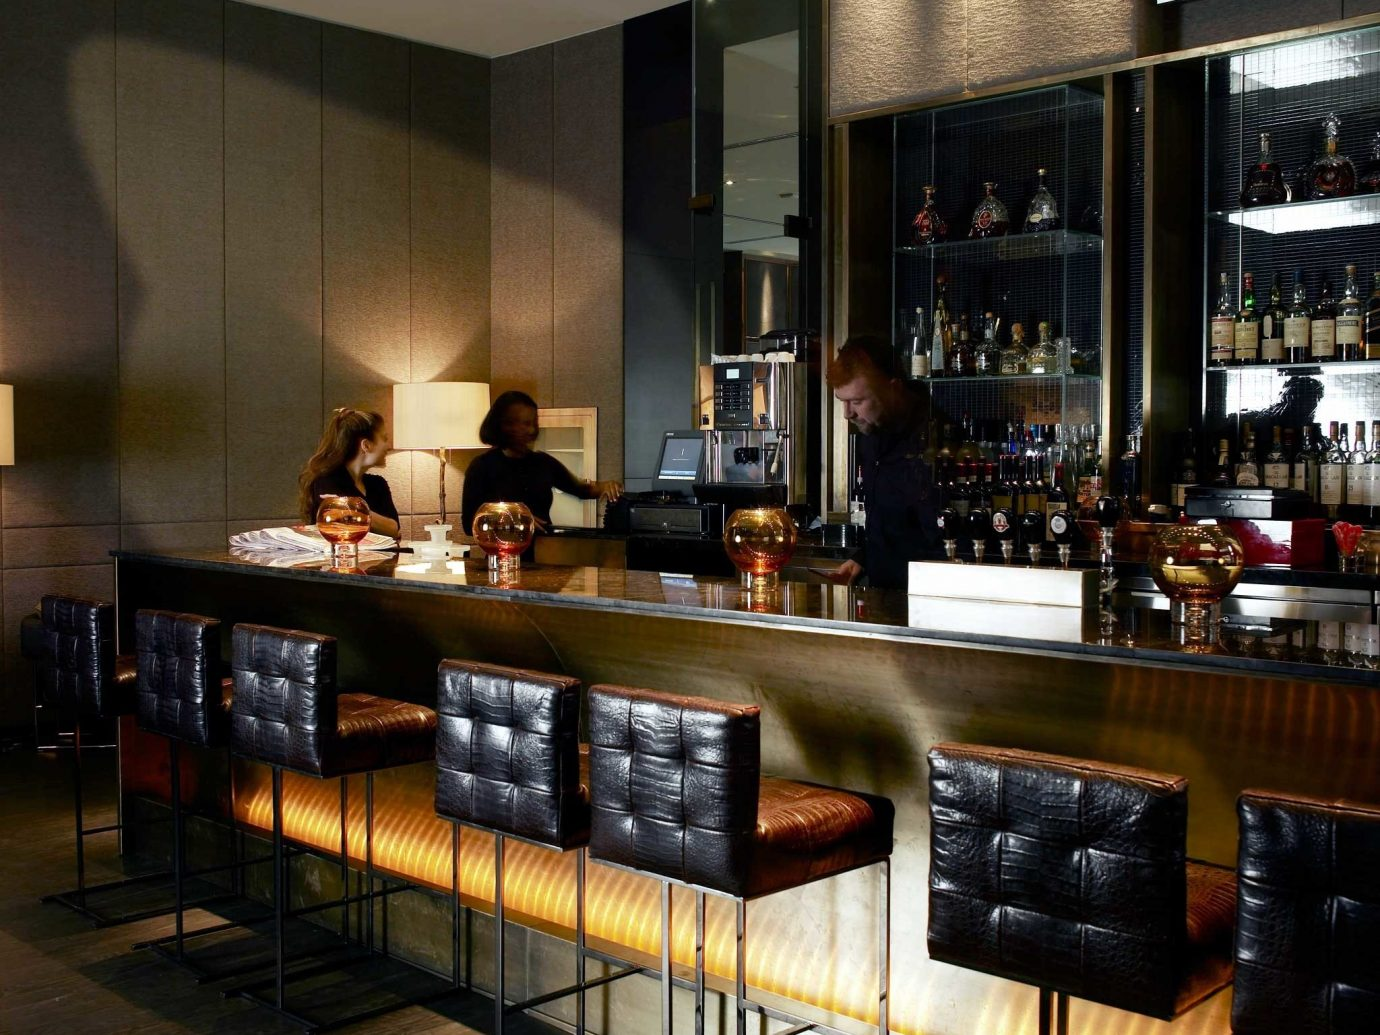 Bar Canada Drink Hotels Luxury Toronto indoor restaurant interior design café meal several